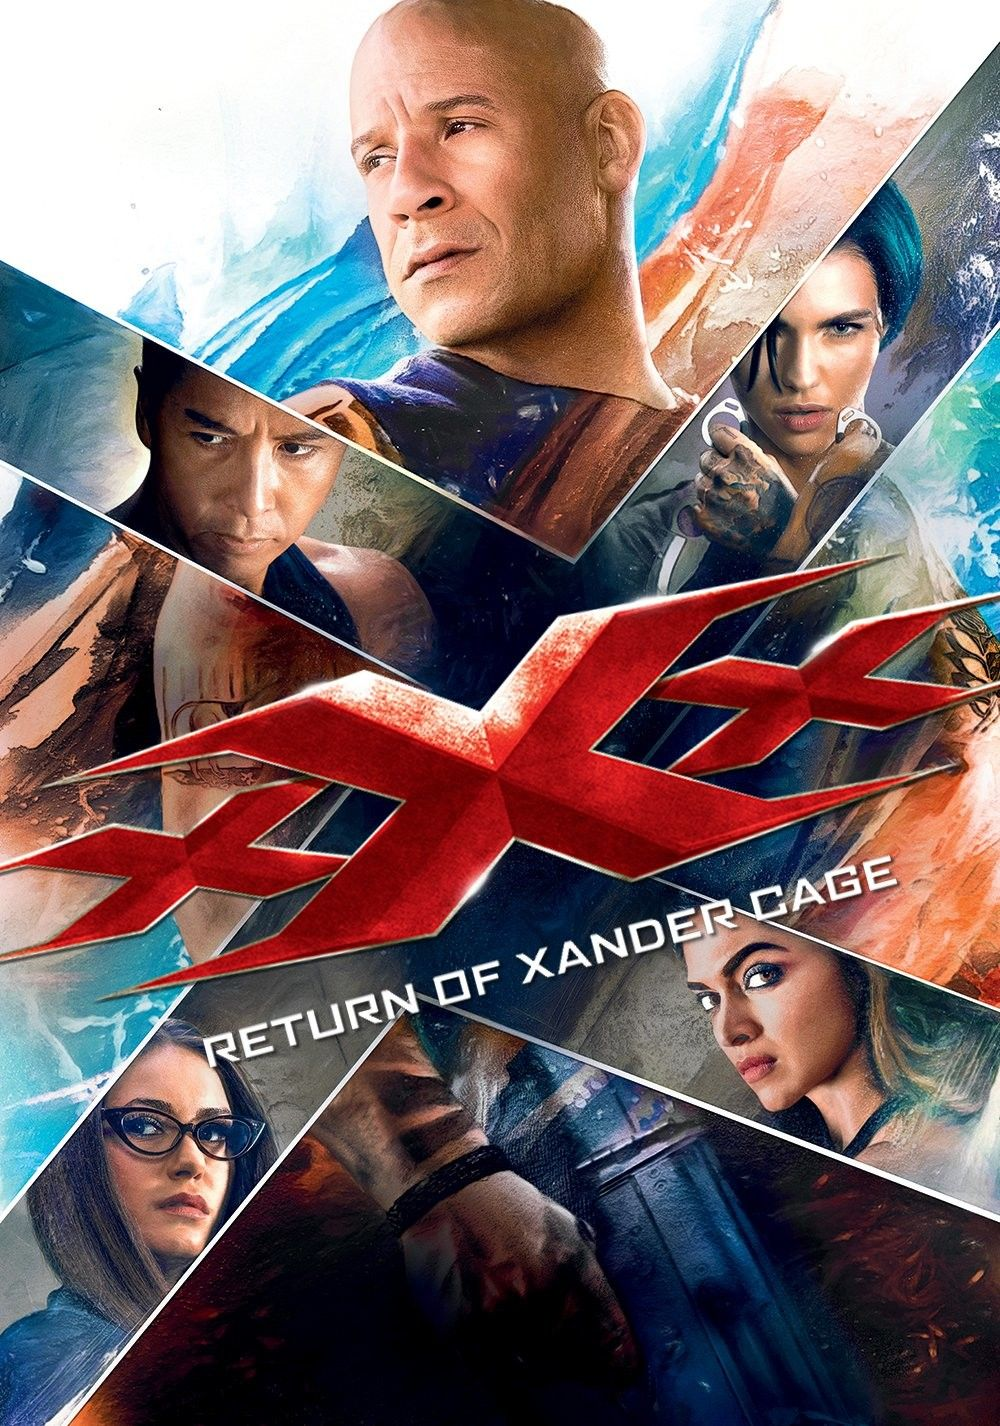 Xxx Return Of Xander Cage Full_movie Hd Online 2017